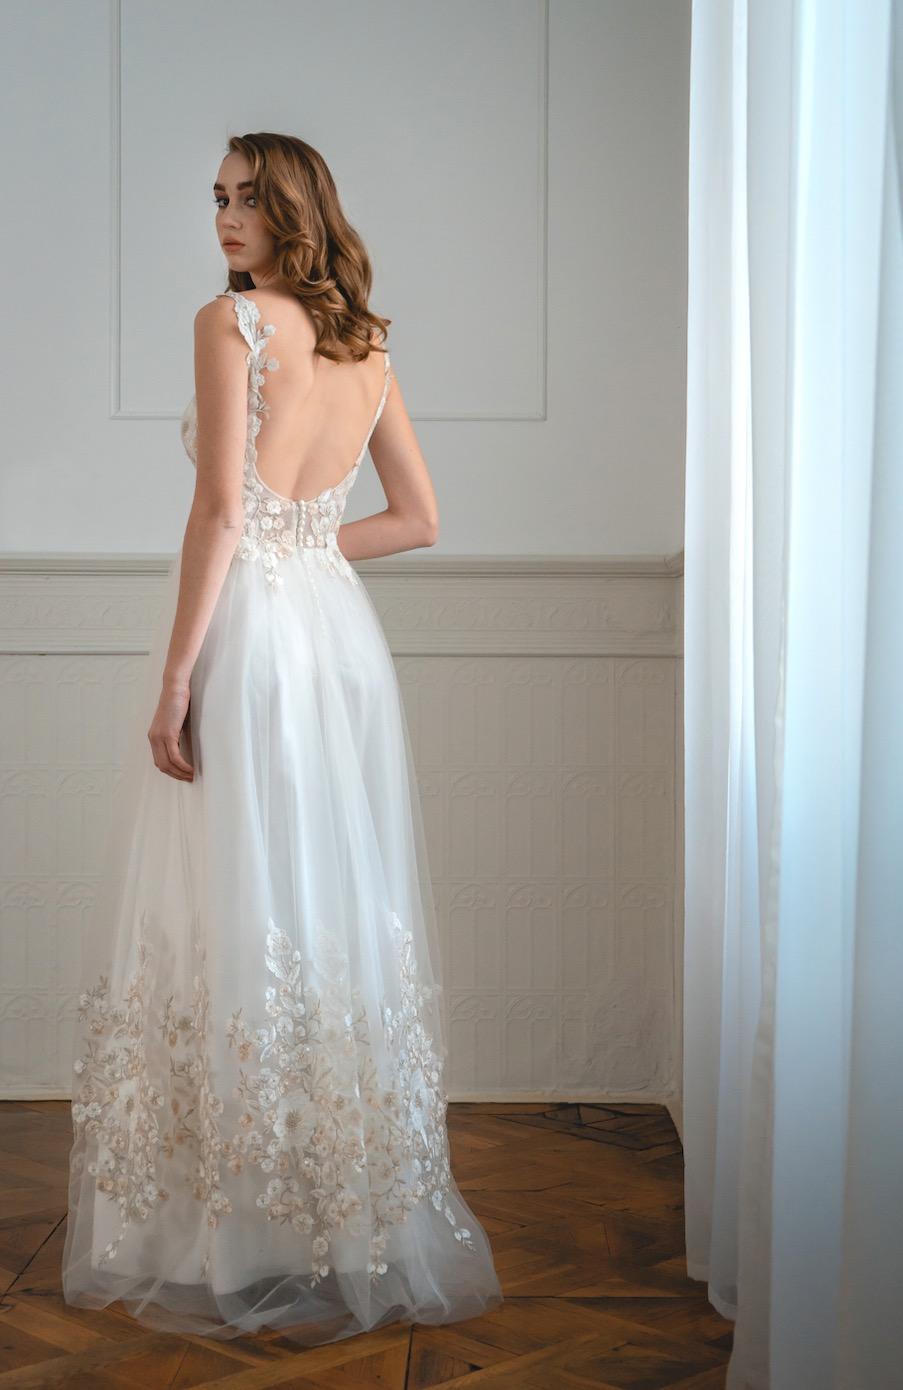 Bridal-Alkmini-08637.jpg